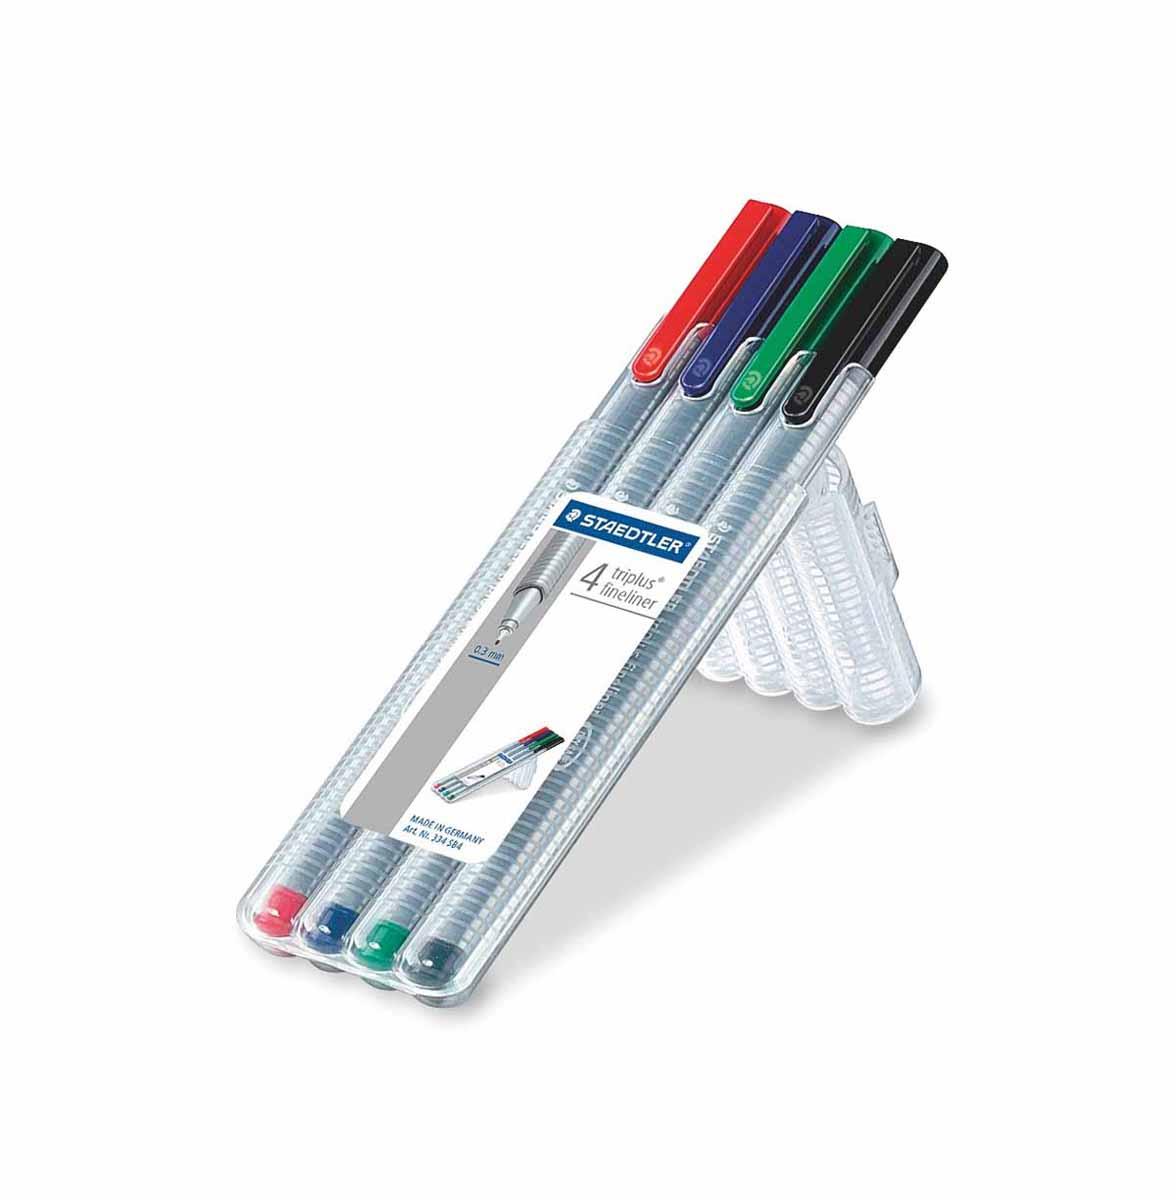 Staedtler Набор капиллярных ручек Triplus 4 цвета набор капиллярных ручек manga shonen